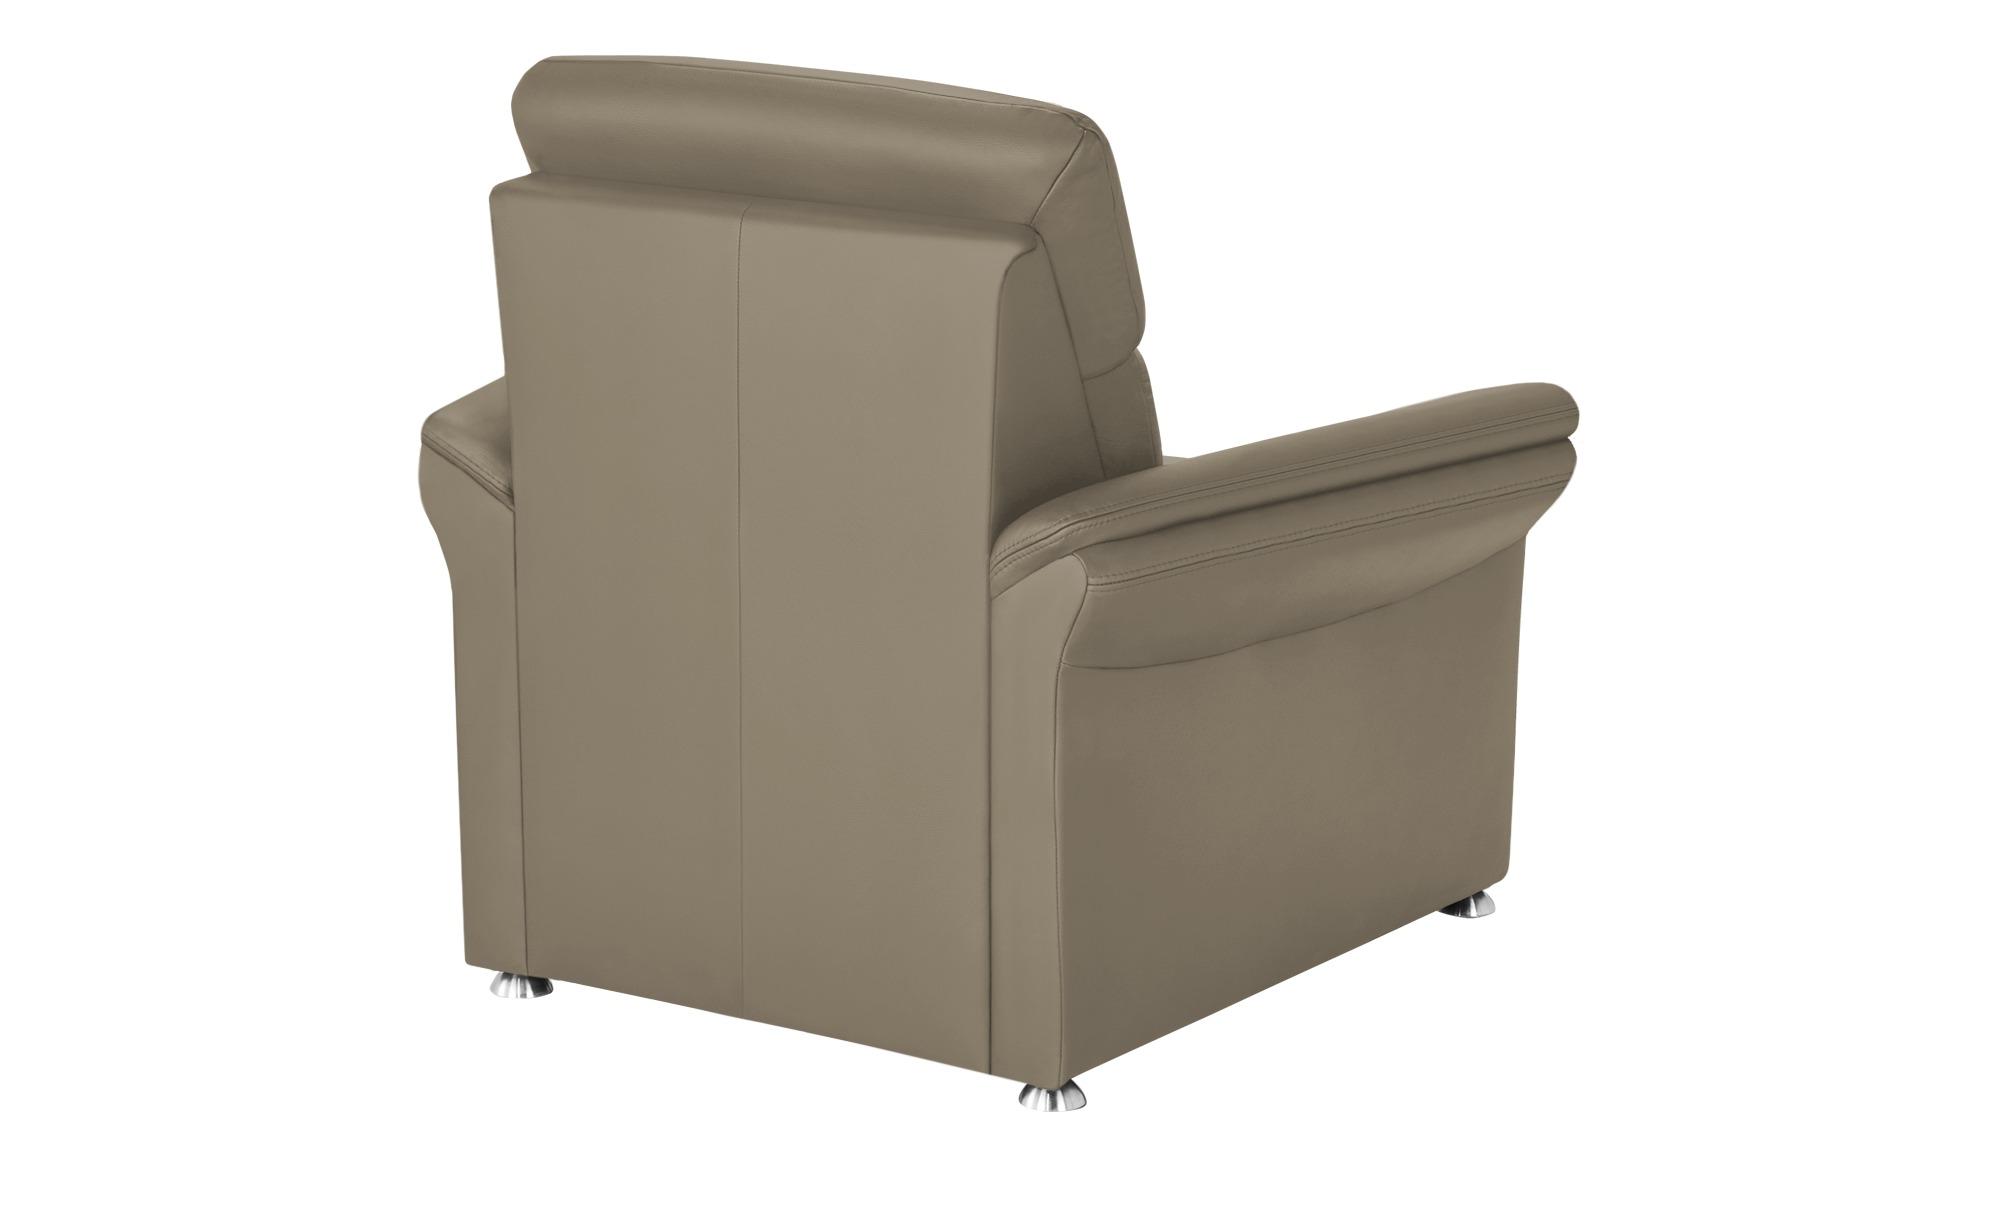 meinSofa Ledersessel grau - Leder Manon ¦ grau ¦ Maße (cm): B: 98 H: 94 T: 92 Polstermöbel > Sessel > Ledersessel - Höffner